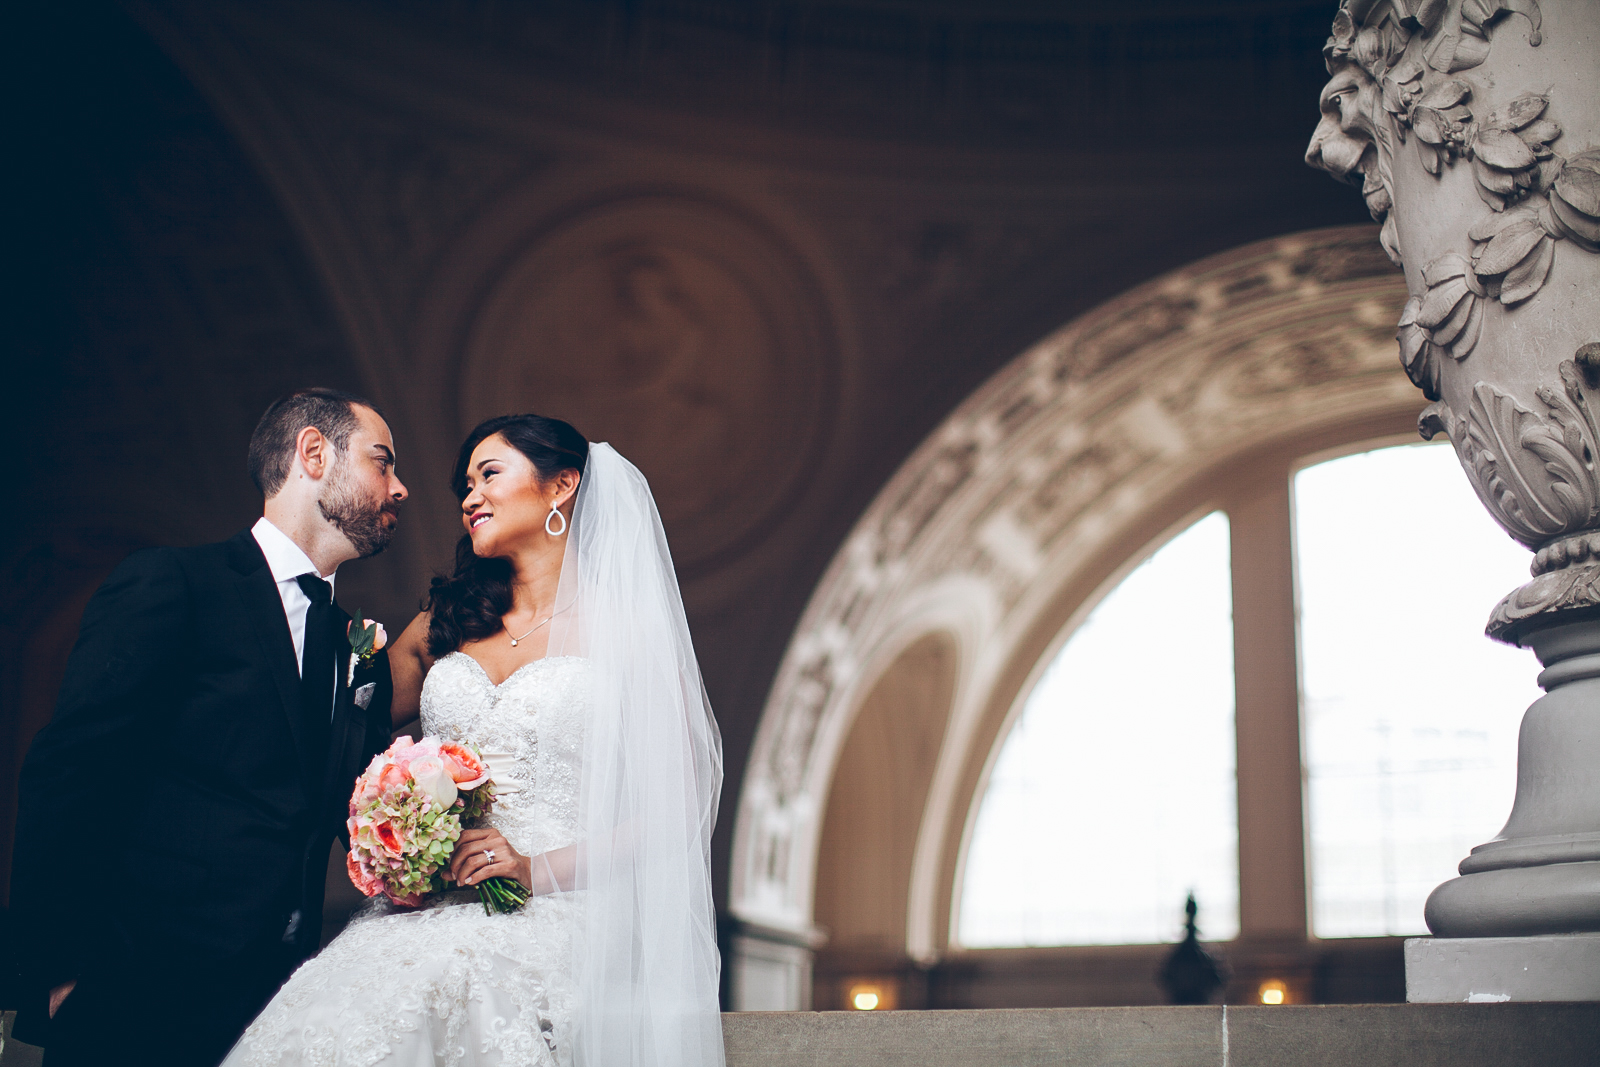 San_francisco_city_hall_wedding_photography_meegan_travis_ebony_siovhan_bokeh_photography_43.jpg